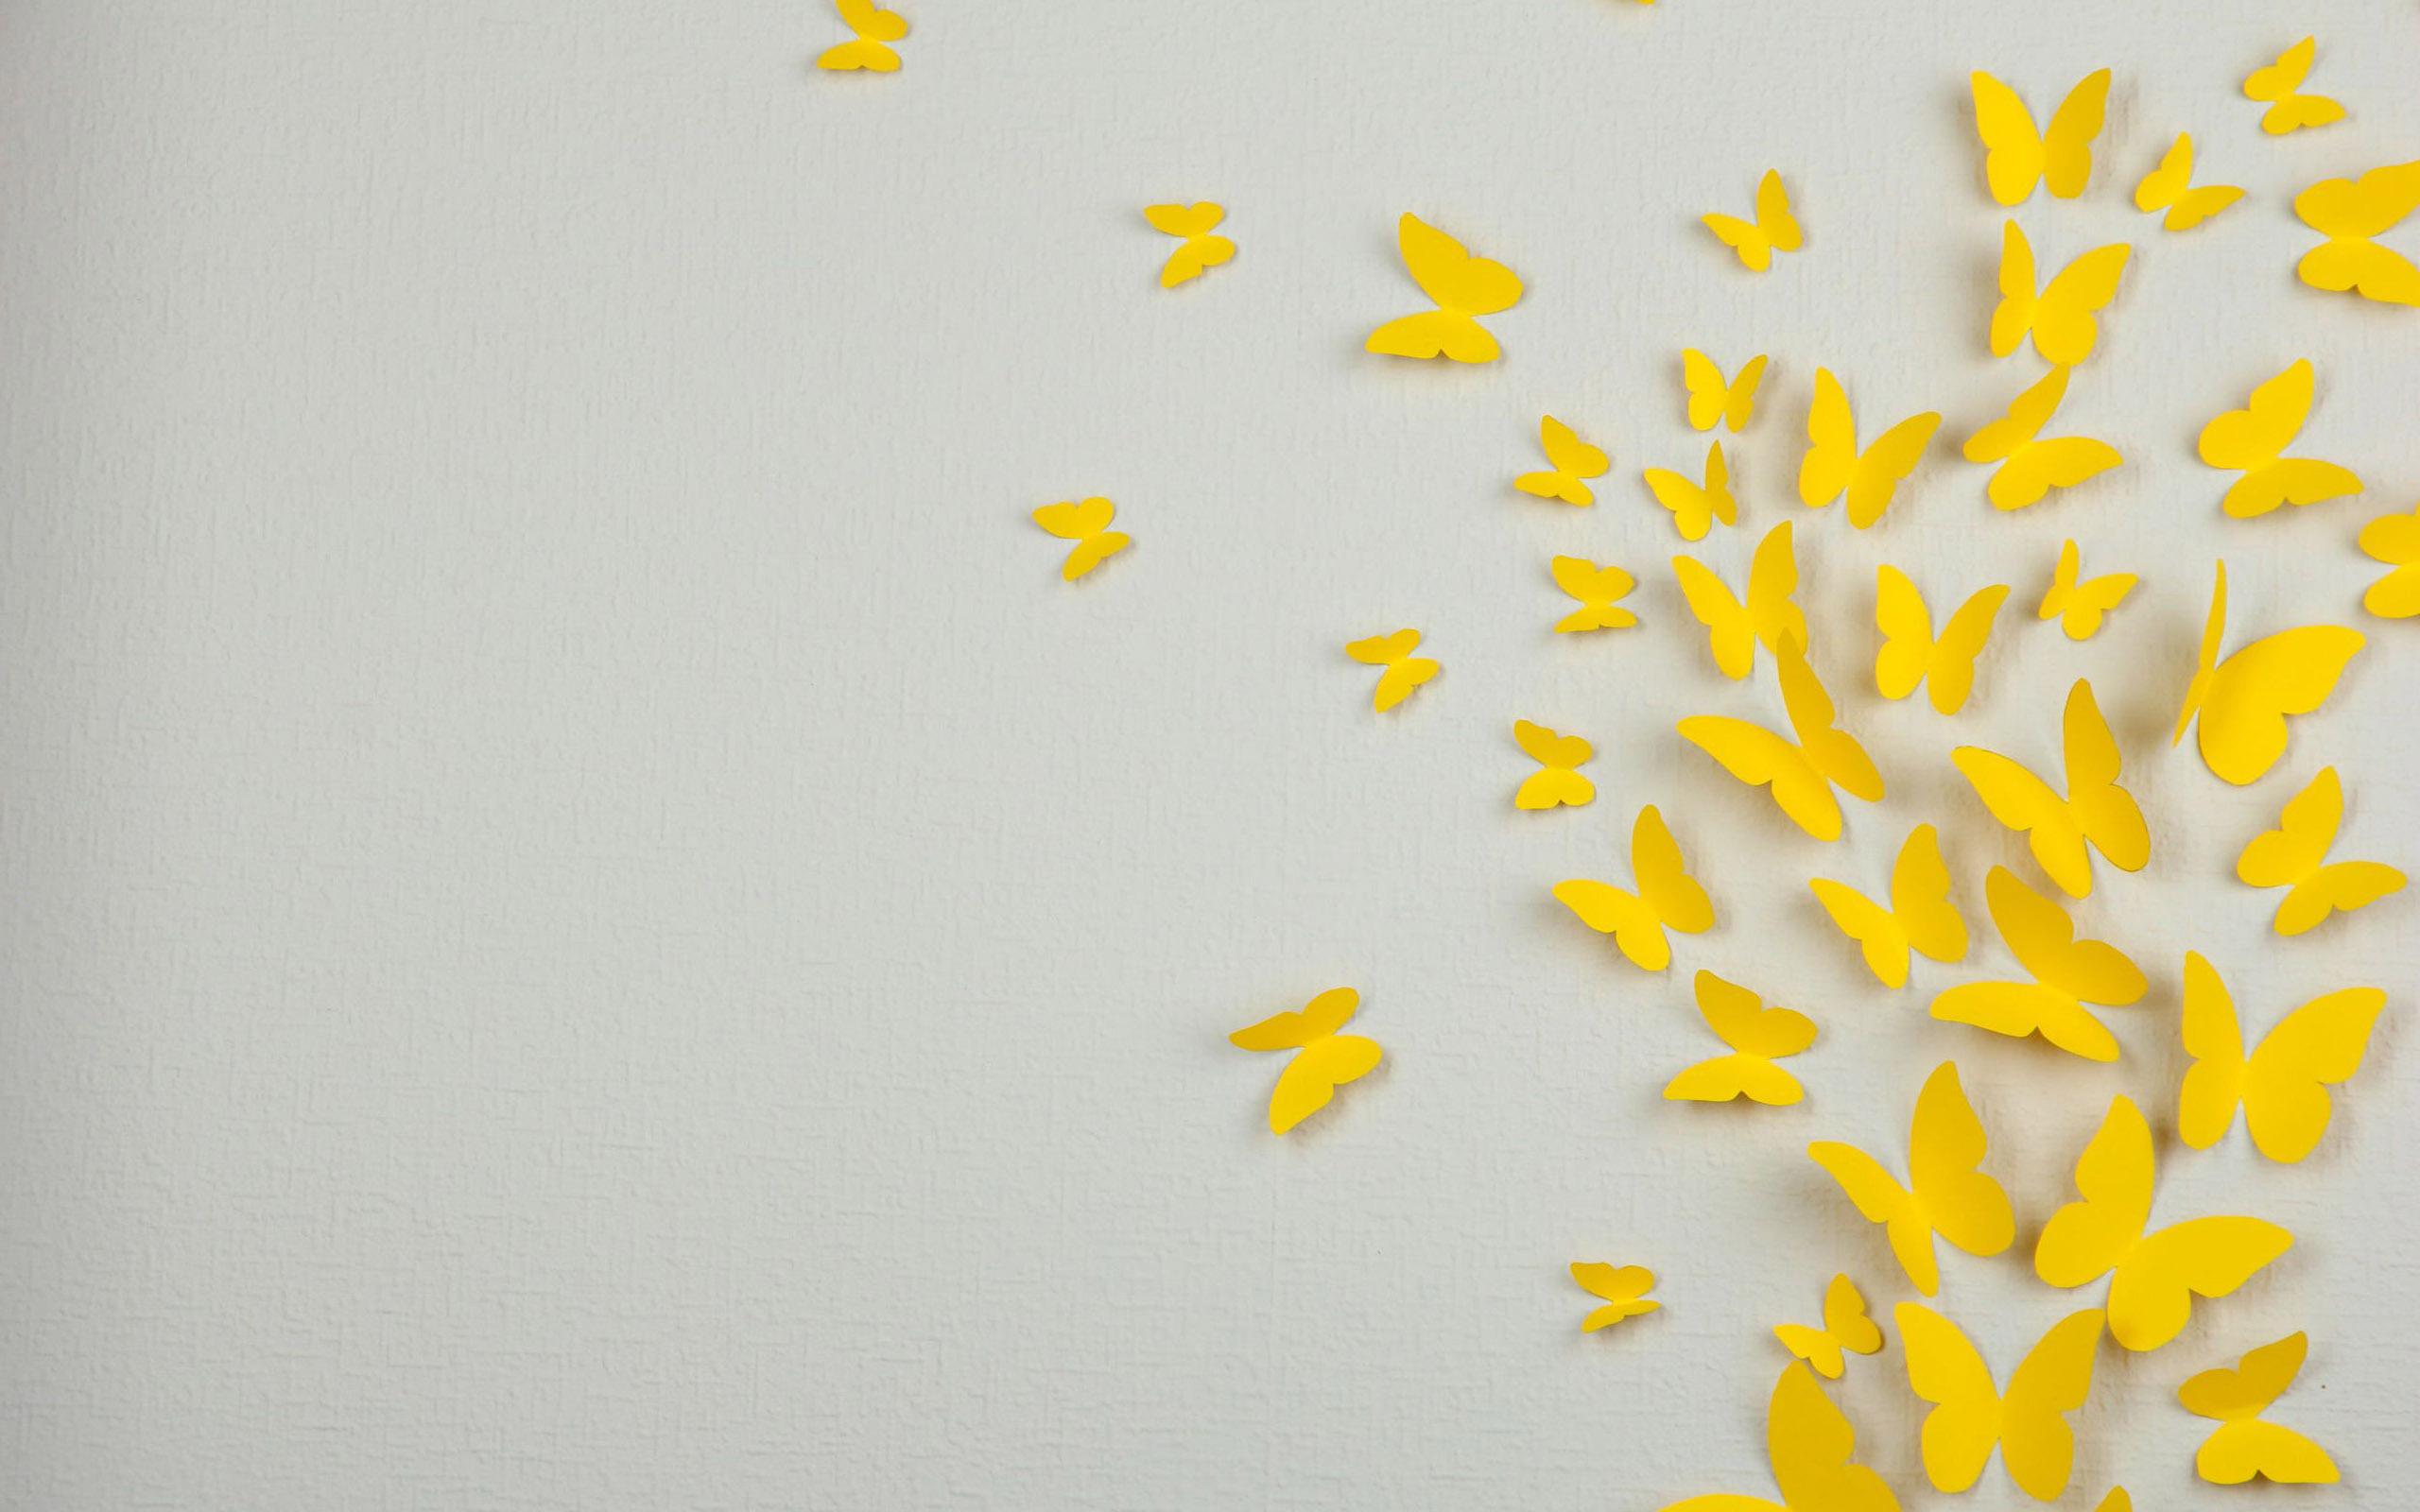 butterfly images free yellow HD Desktop Wallpapers 4k HD